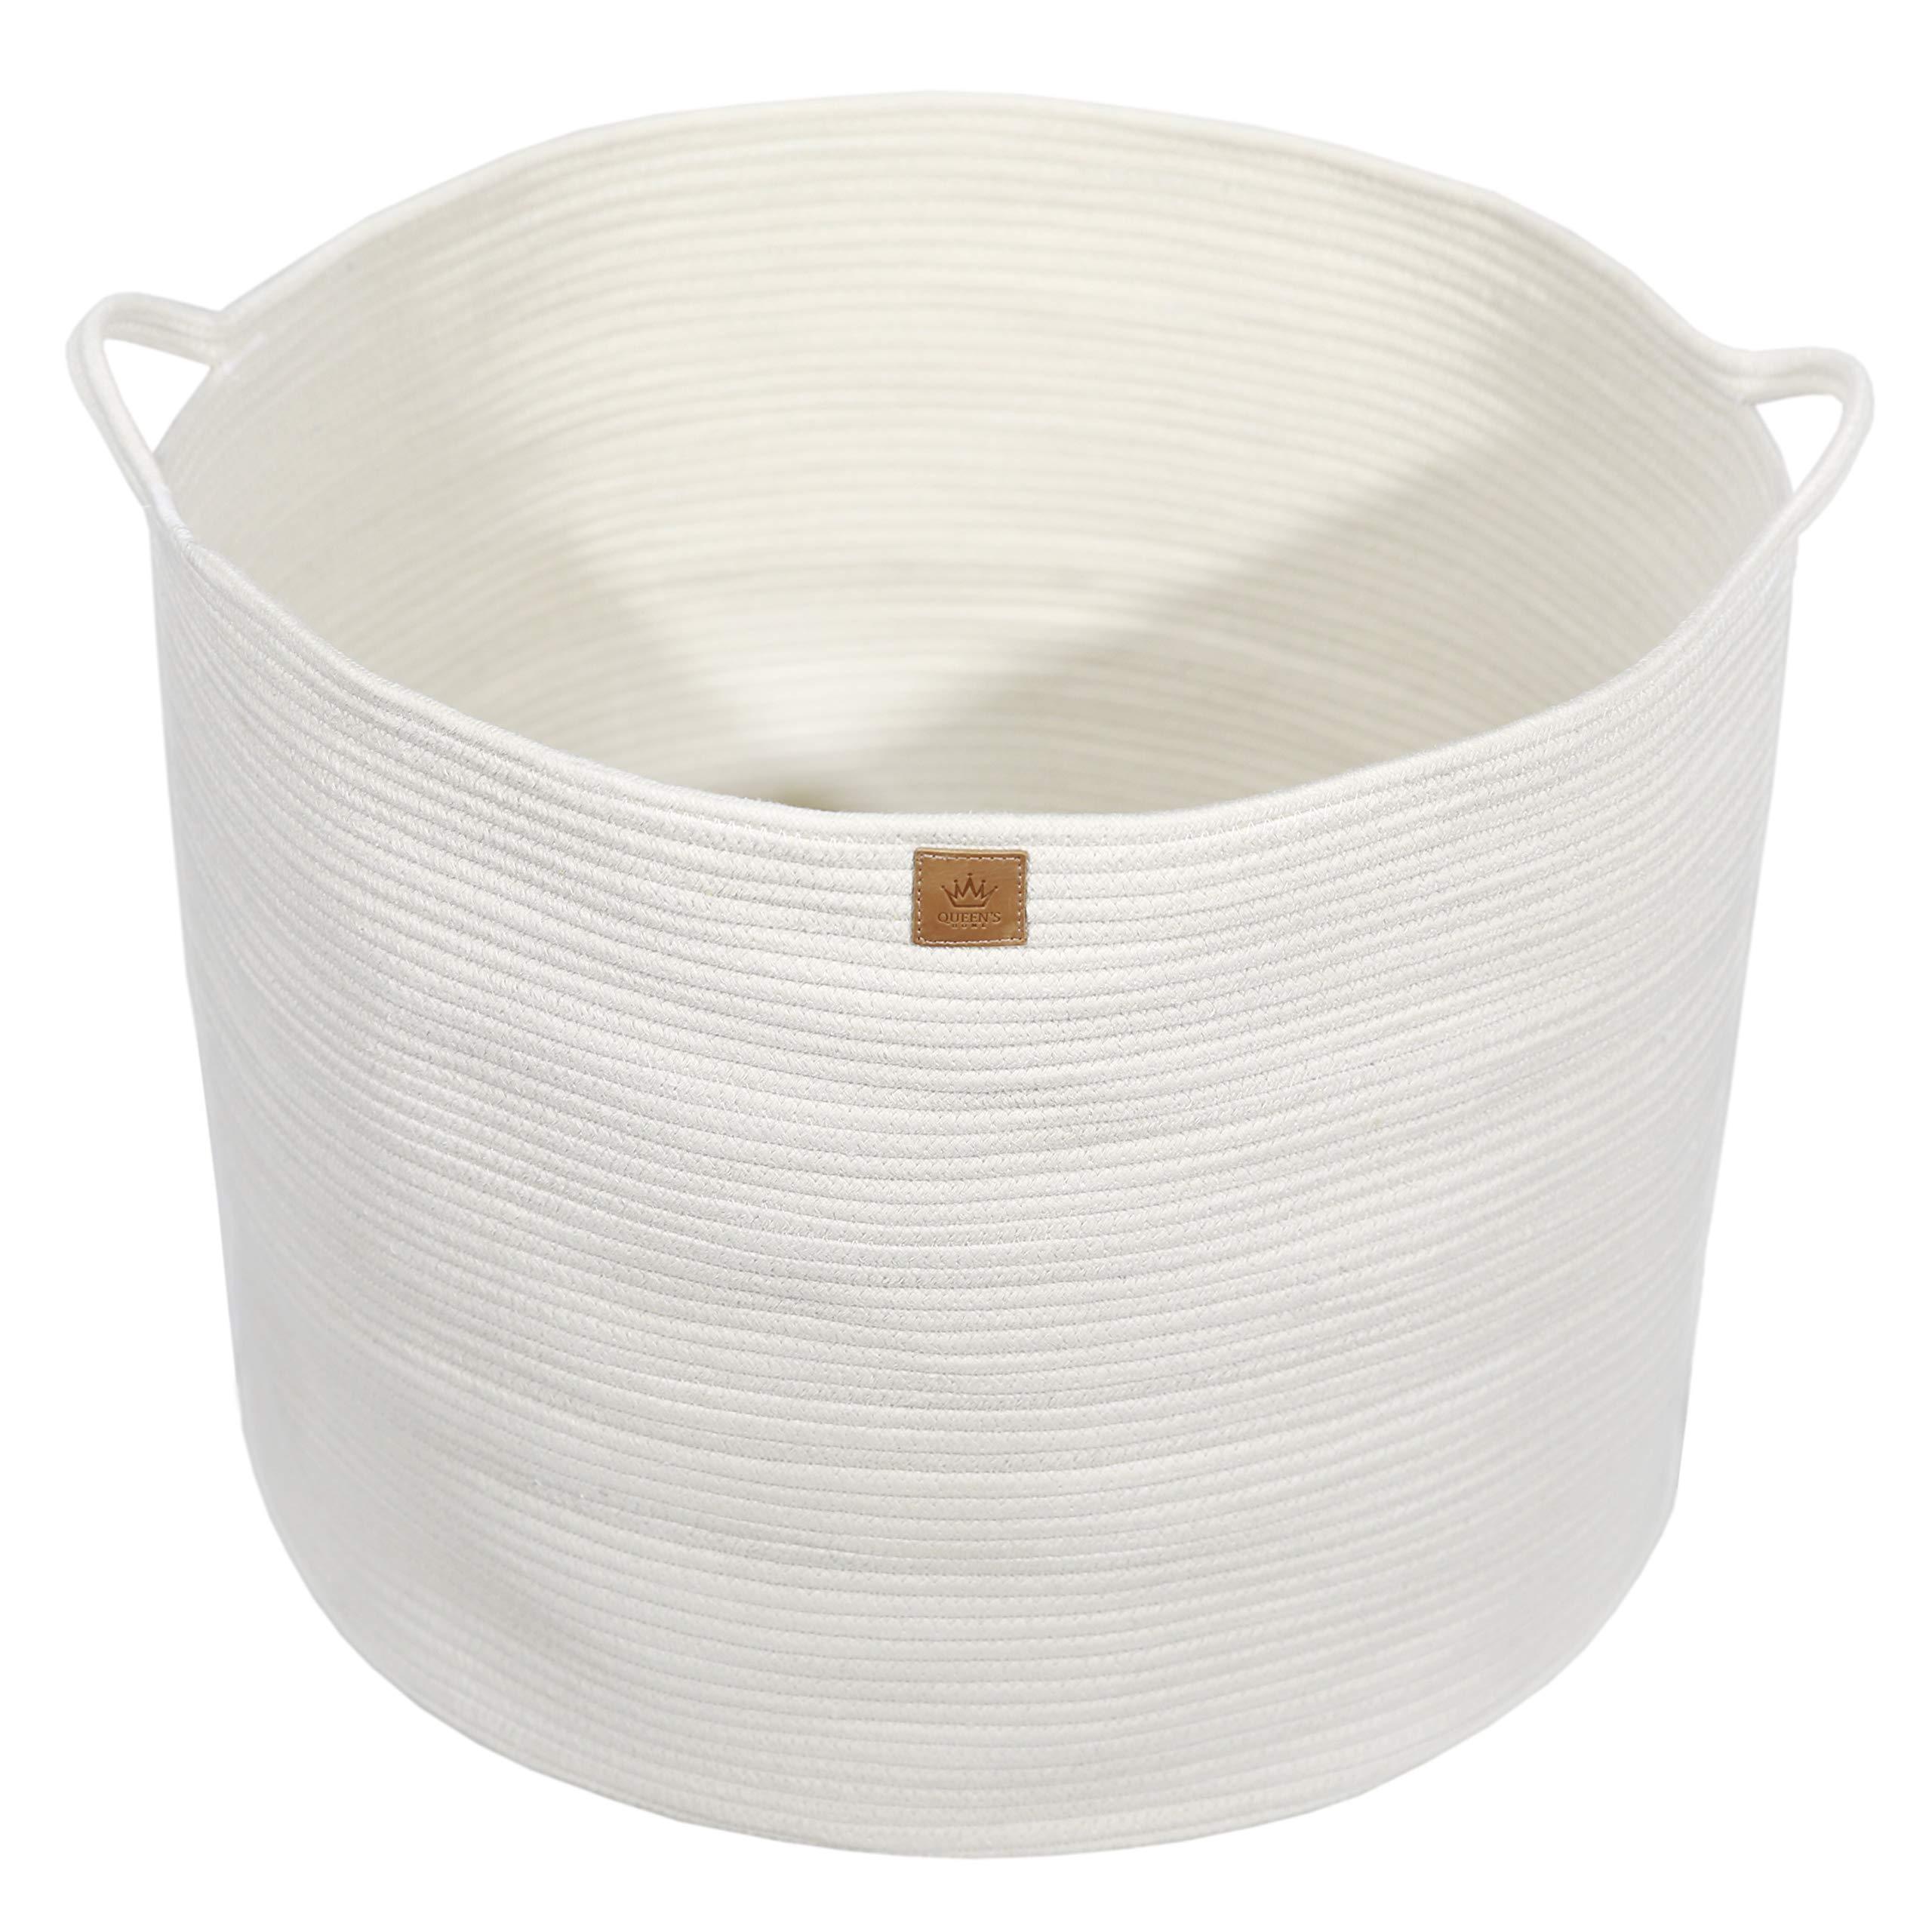 Queen's Home XXXLarge Cotton Rope Basket - 22''x22''x18'' Woven Round Baskets with Handles - Baby Laundry Basket for Kids Toy Towels Blanket Comforter Planter - Decorative Storage Basket Nursery Bin